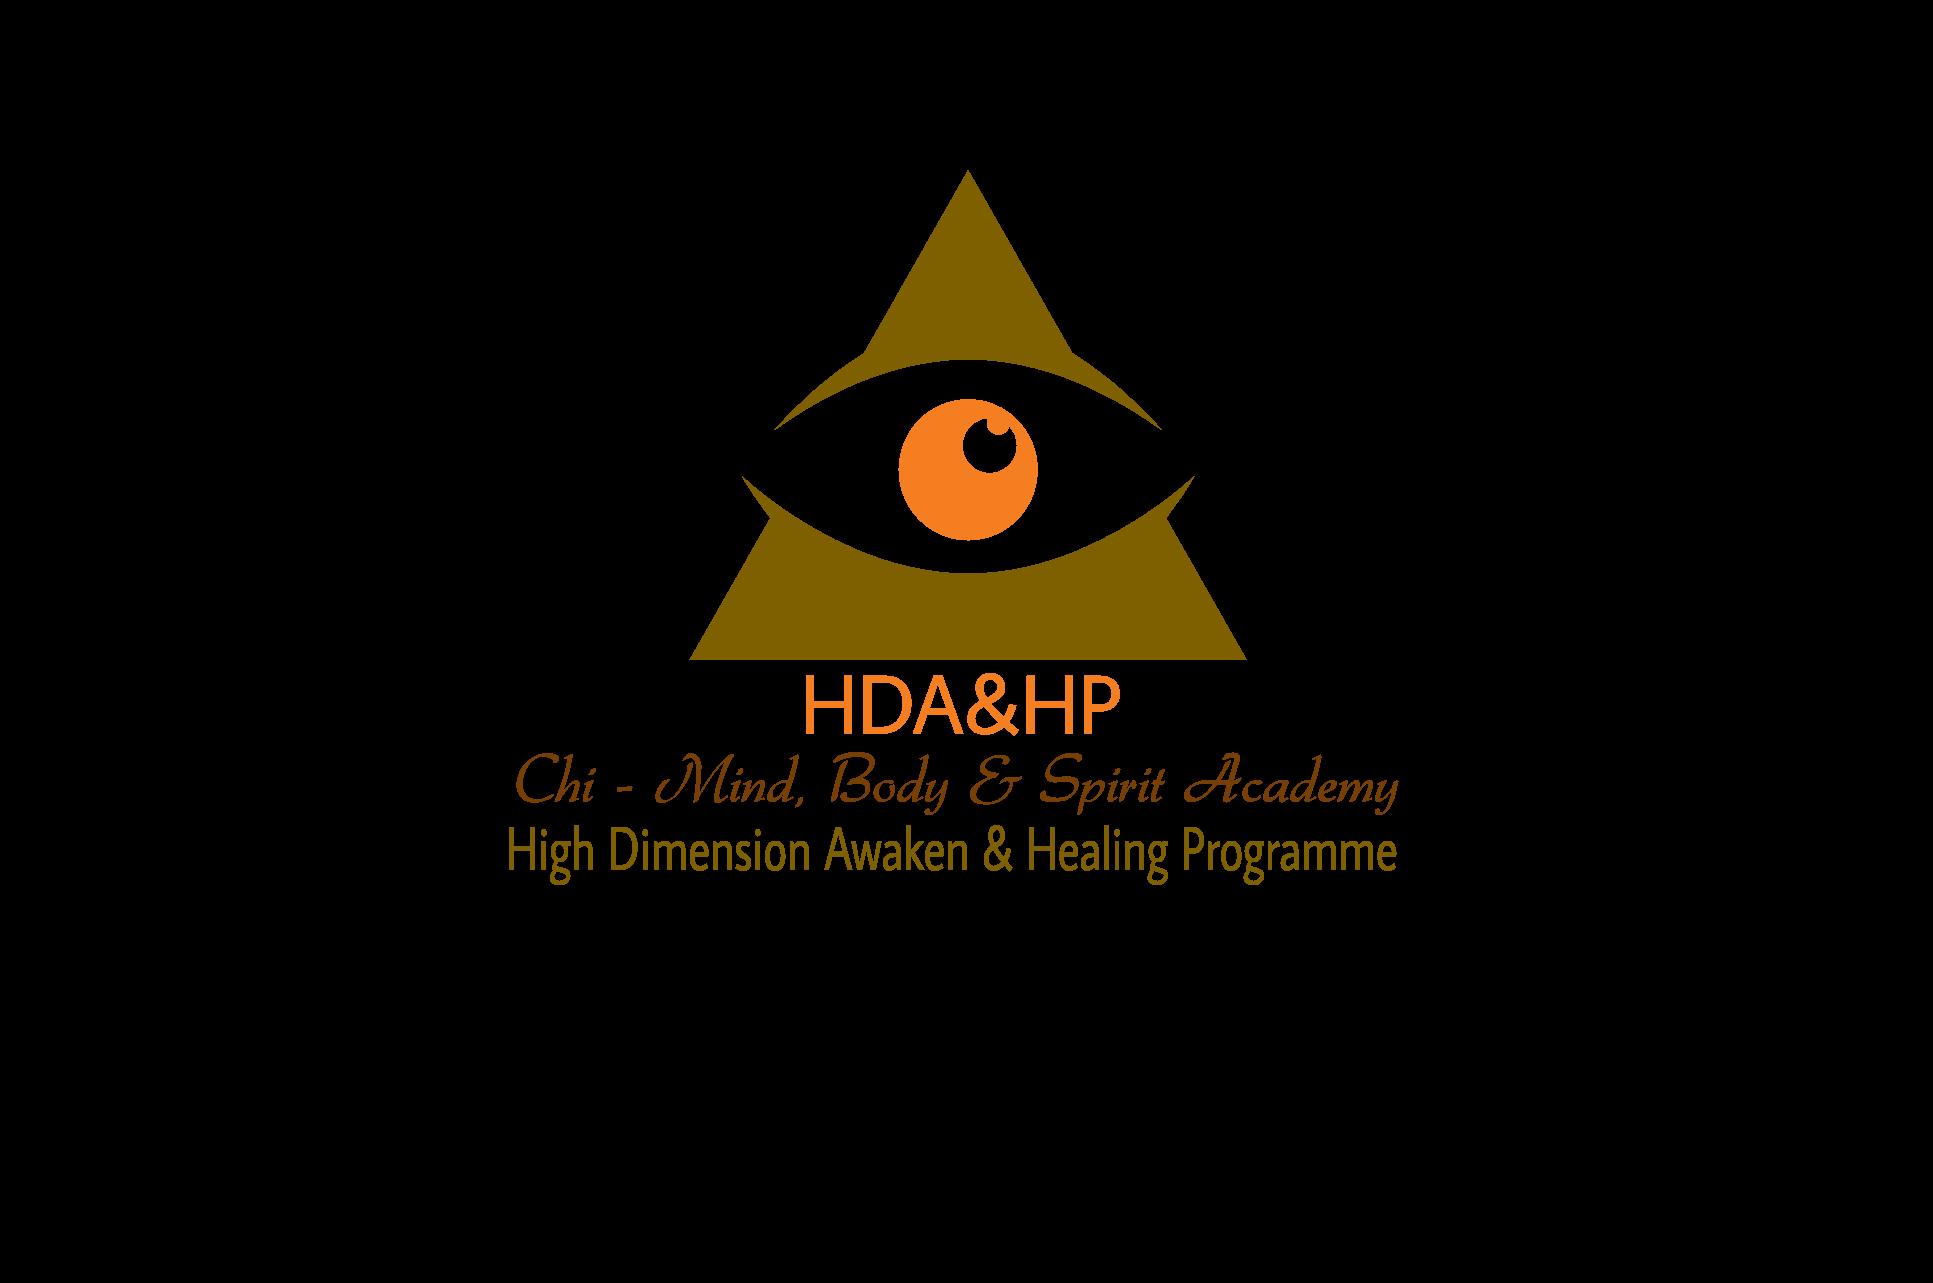 hdahp-logo-blackgold